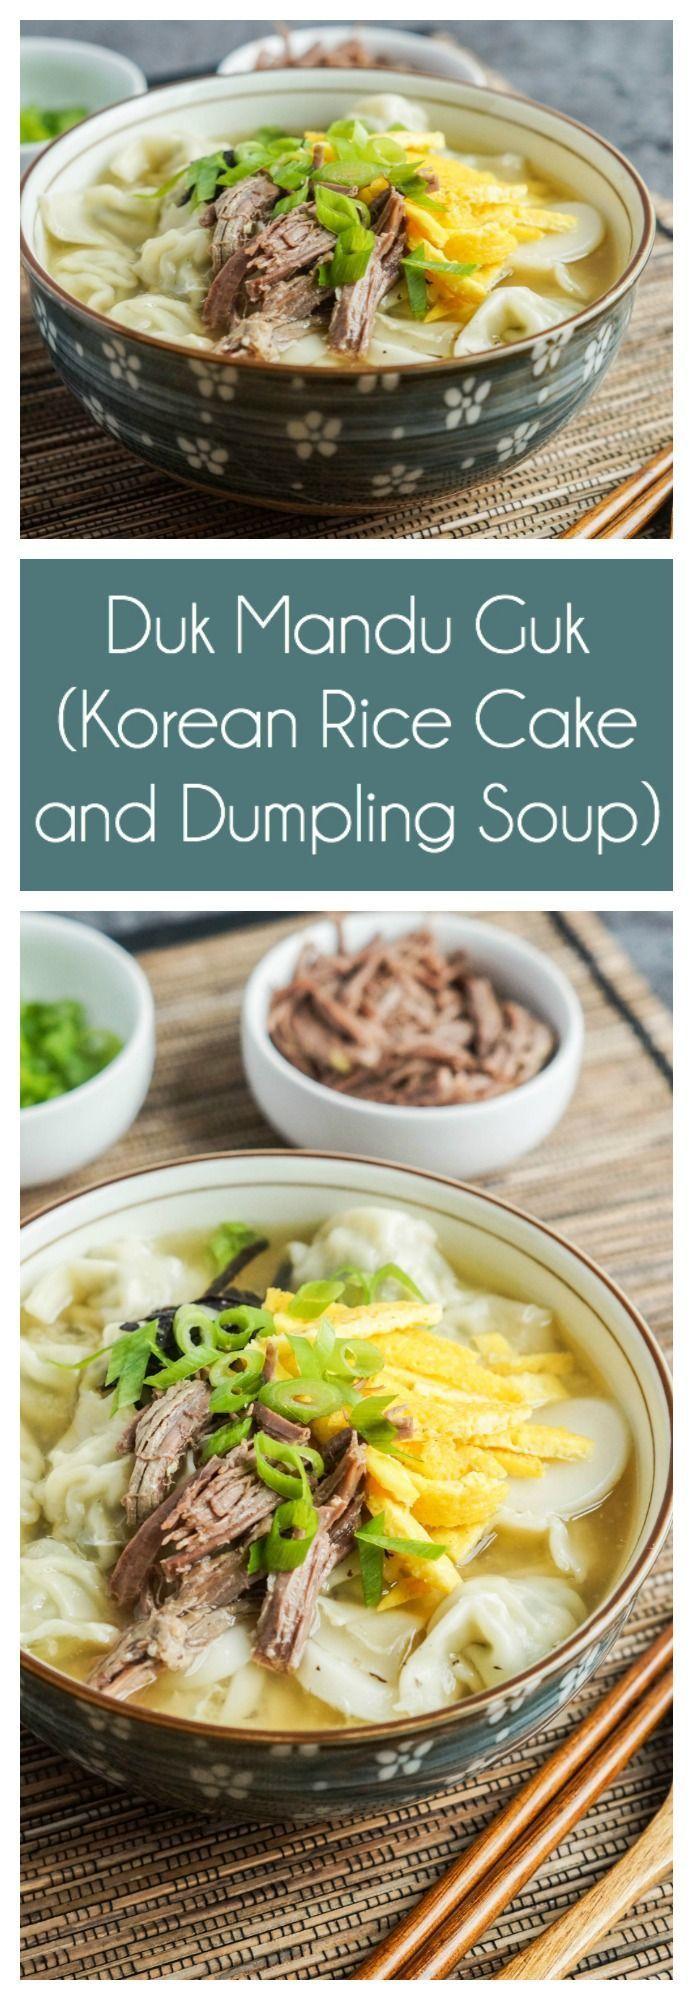 Blue apron korean rice cakes - Duk Mandu Guk Korean Rice Cake And Dumpling Soup Dduk Duk